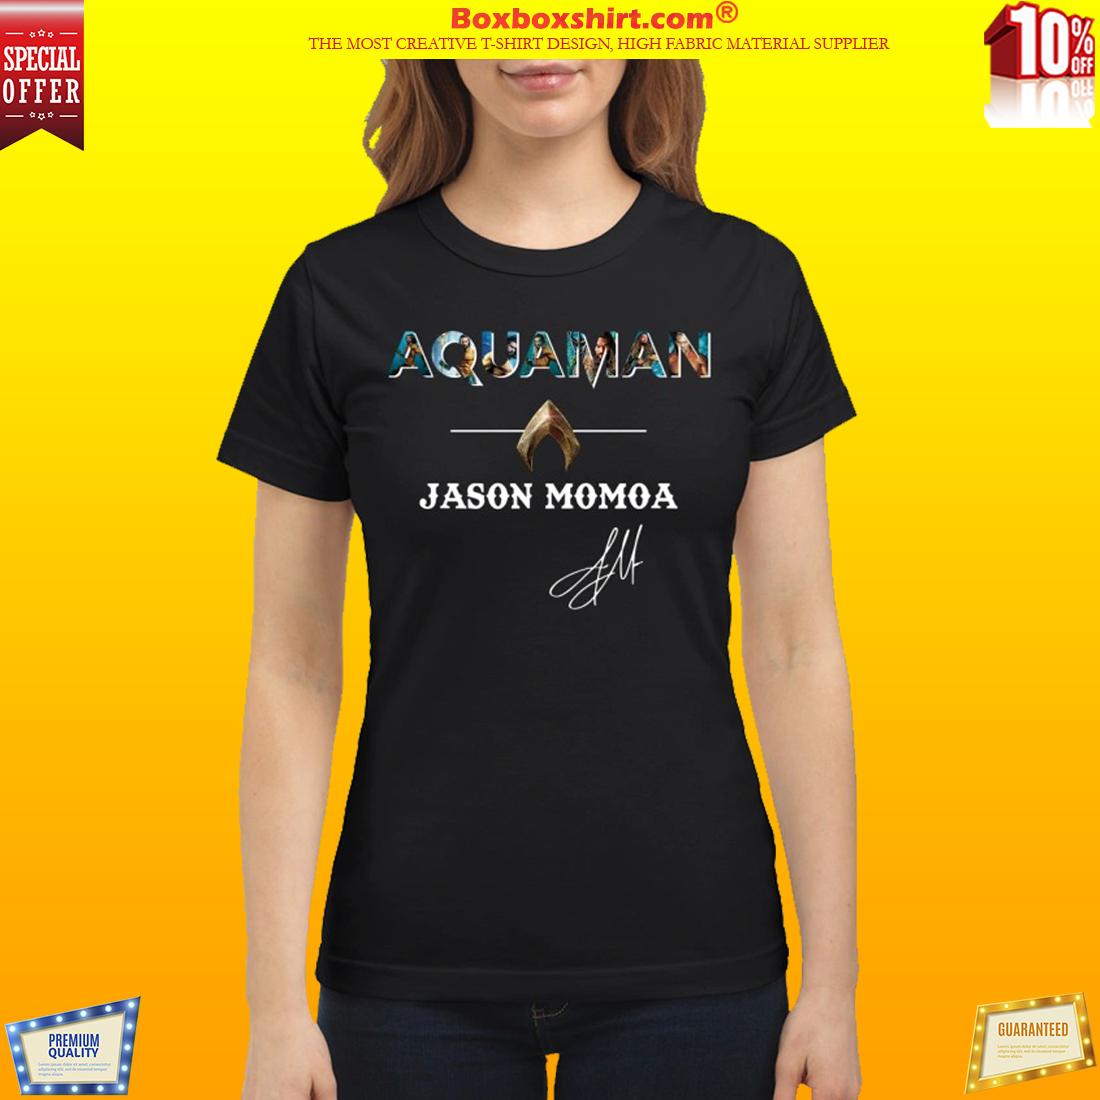 Aquaman Jason Momoa sign classic shirt and sweatshirt